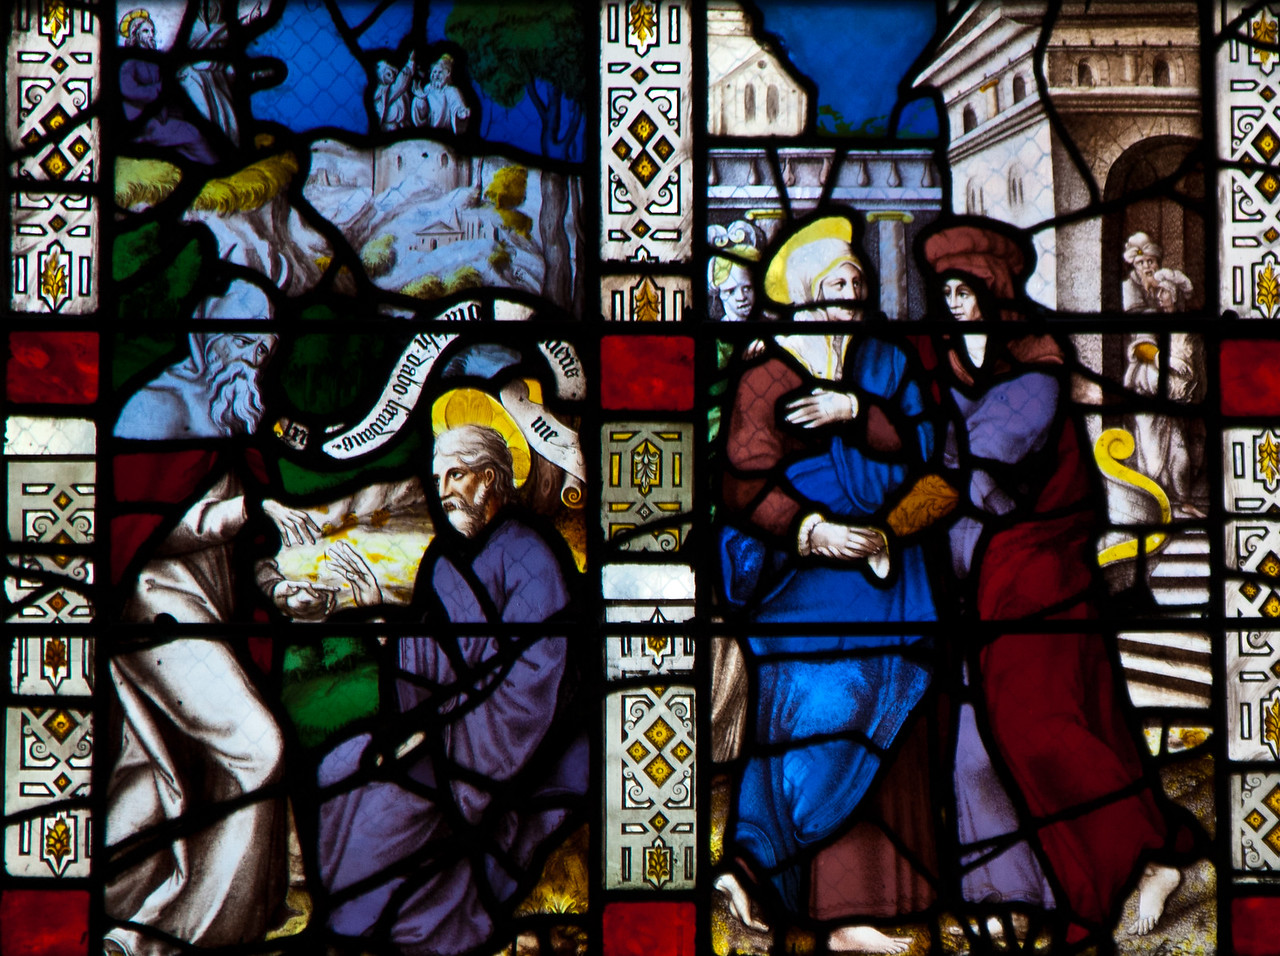 Troyes - Saint-Jean-au-Marche - The Passion Window - Visitation & Unindentified Scene